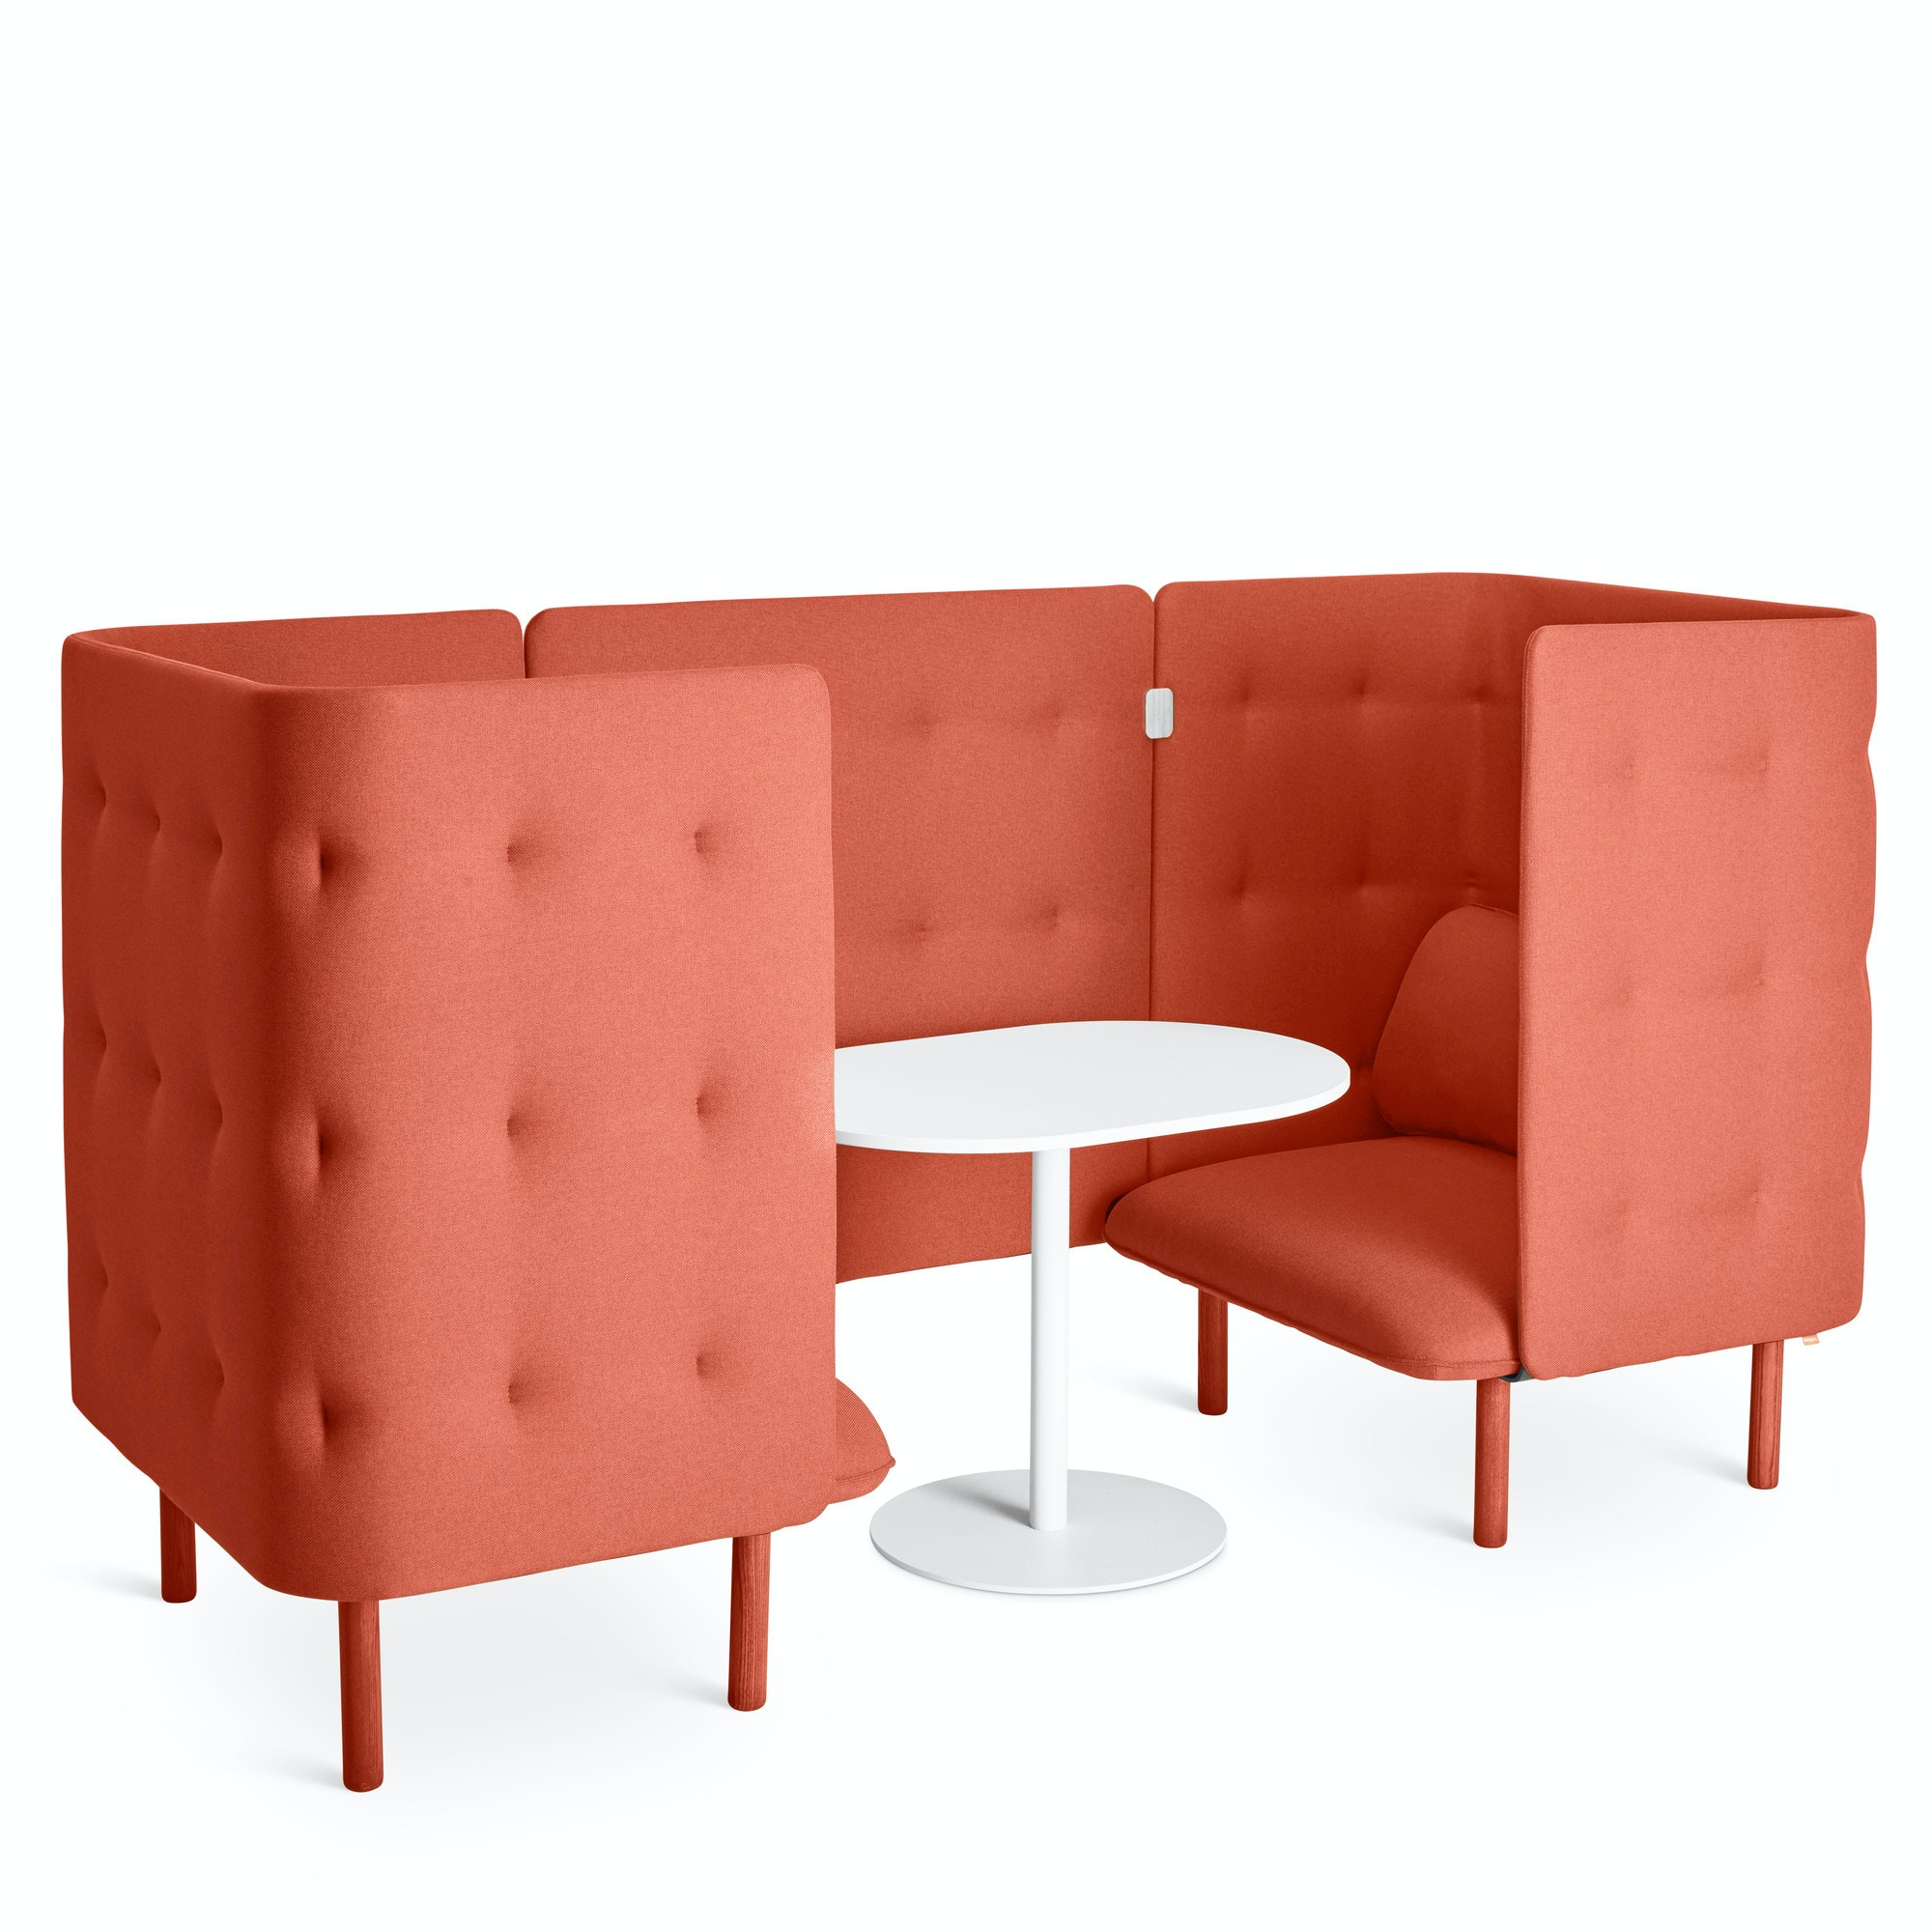 the bricks furniture. Brick QT Chair Booth,Brick,hi-res The Bricks Furniture A